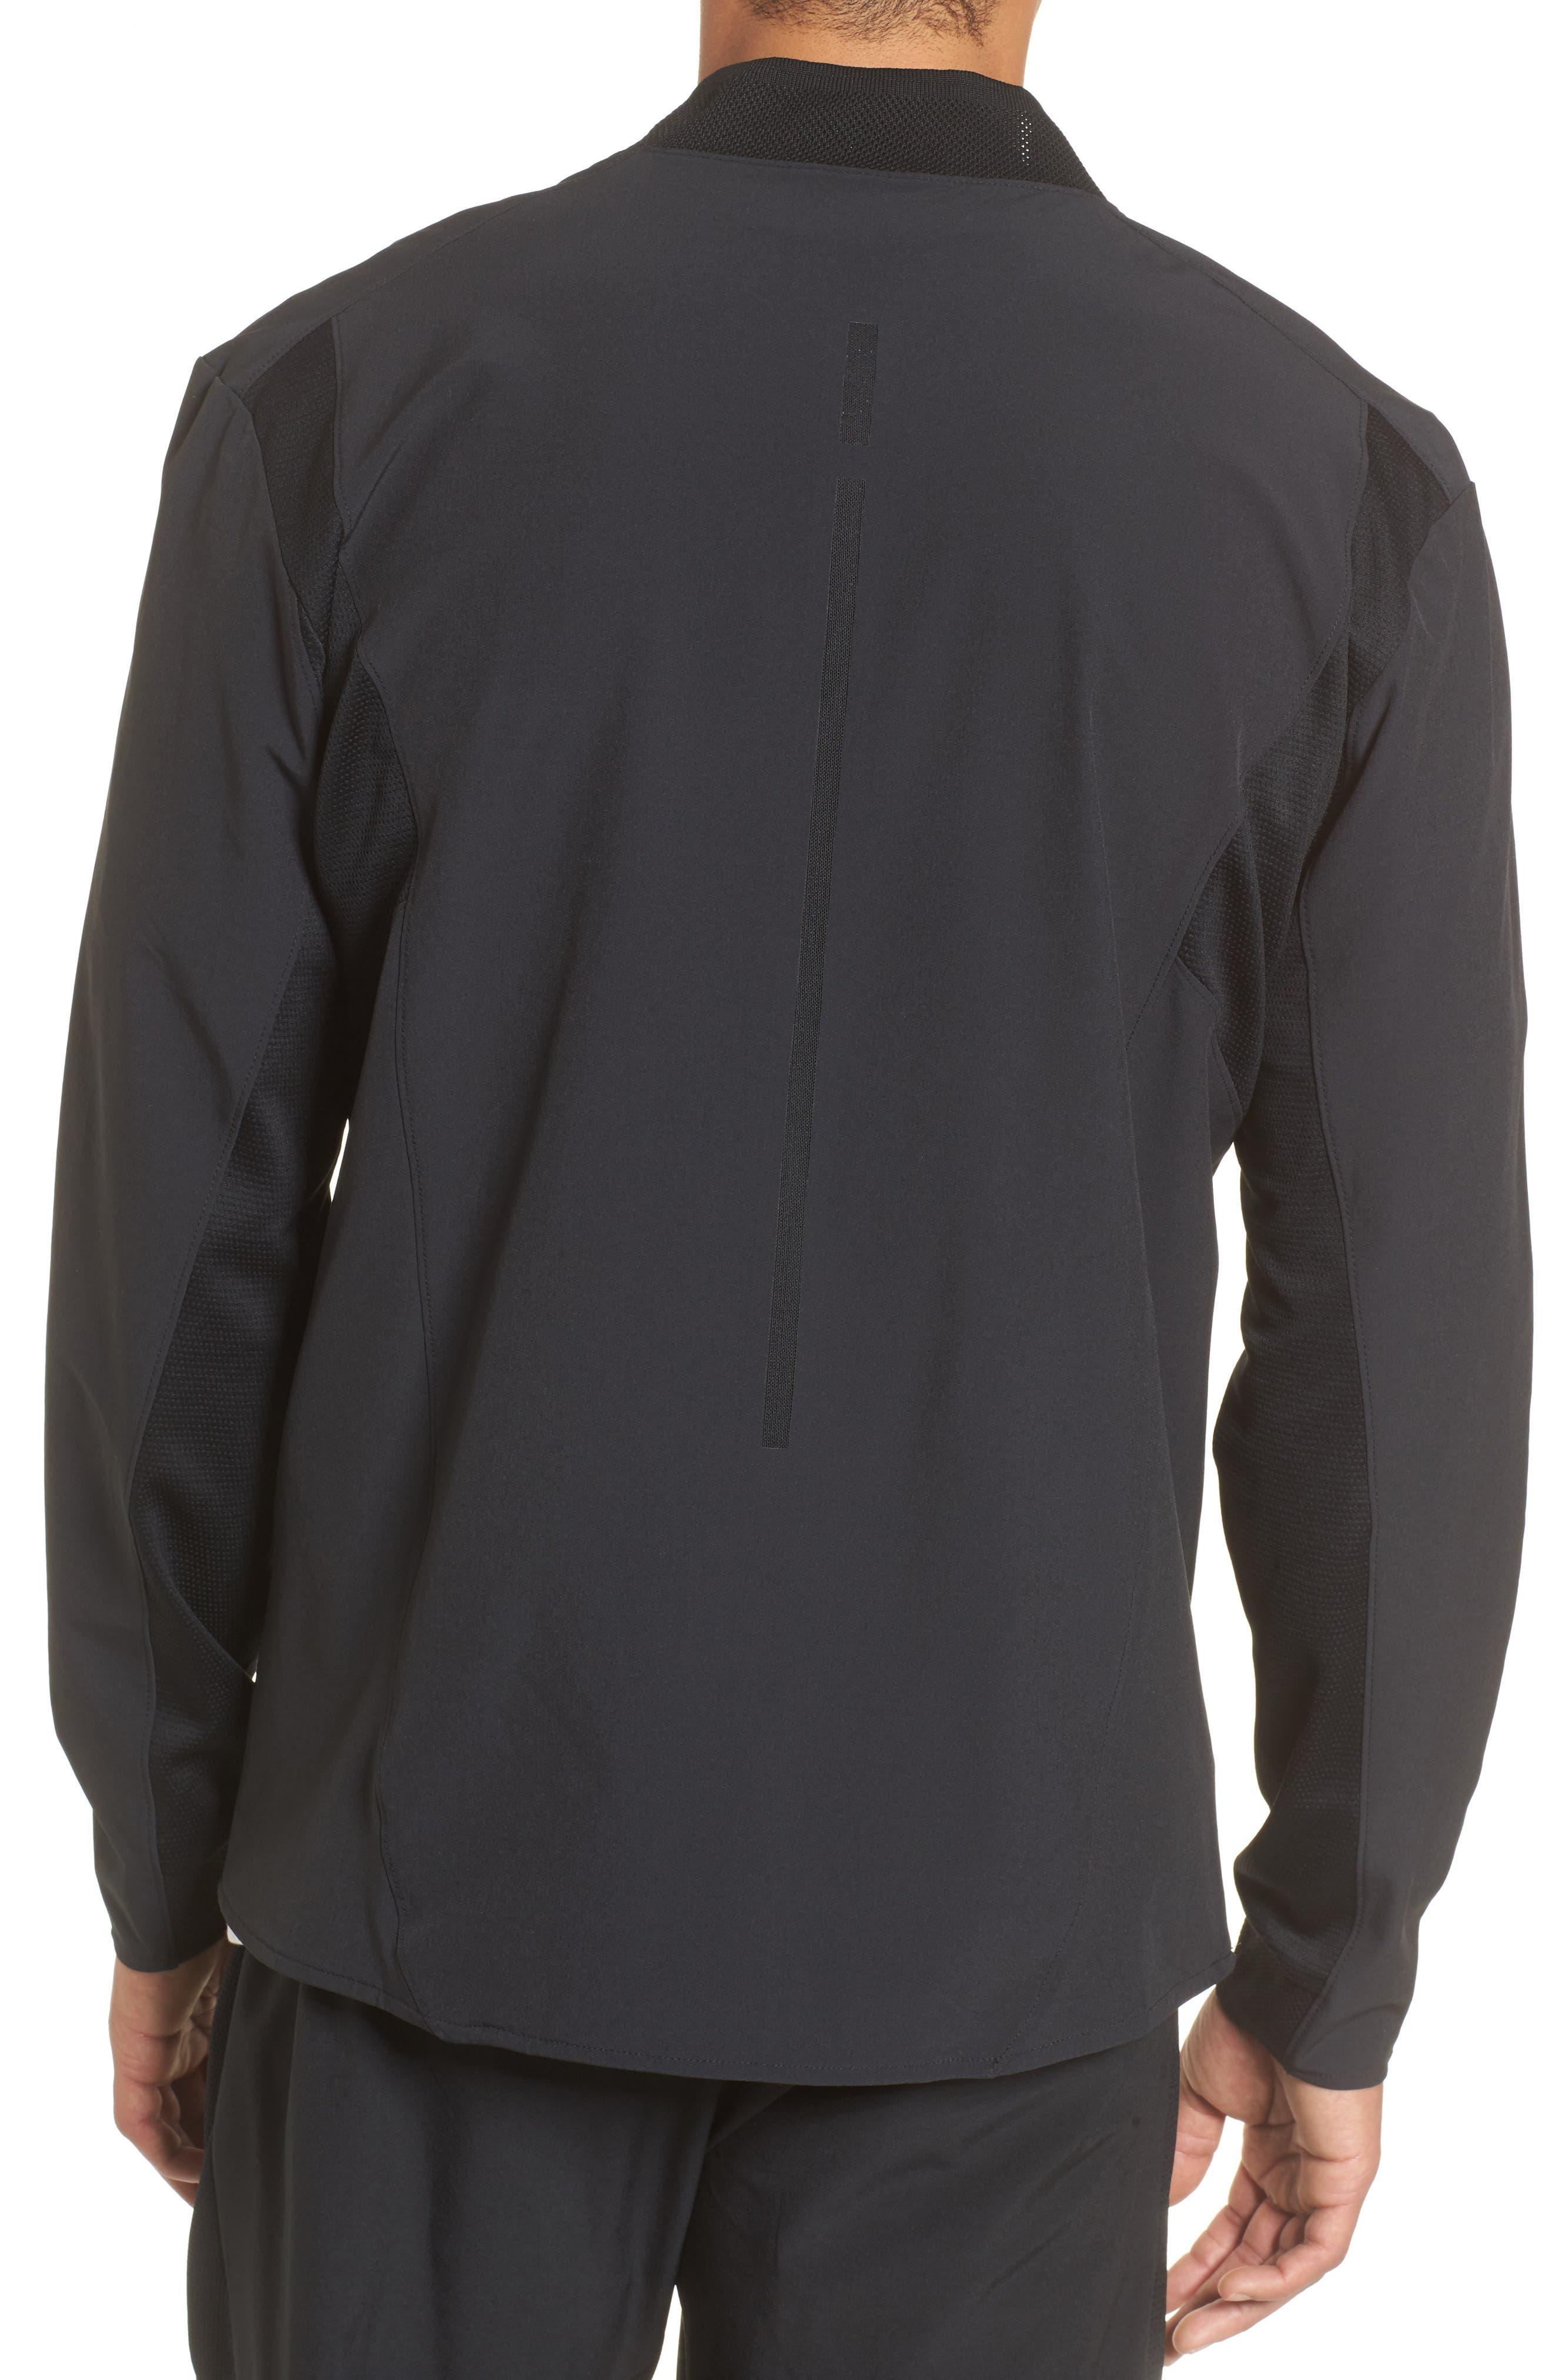 23 Alpha Dry Jacket,                             Alternate thumbnail 2, color,